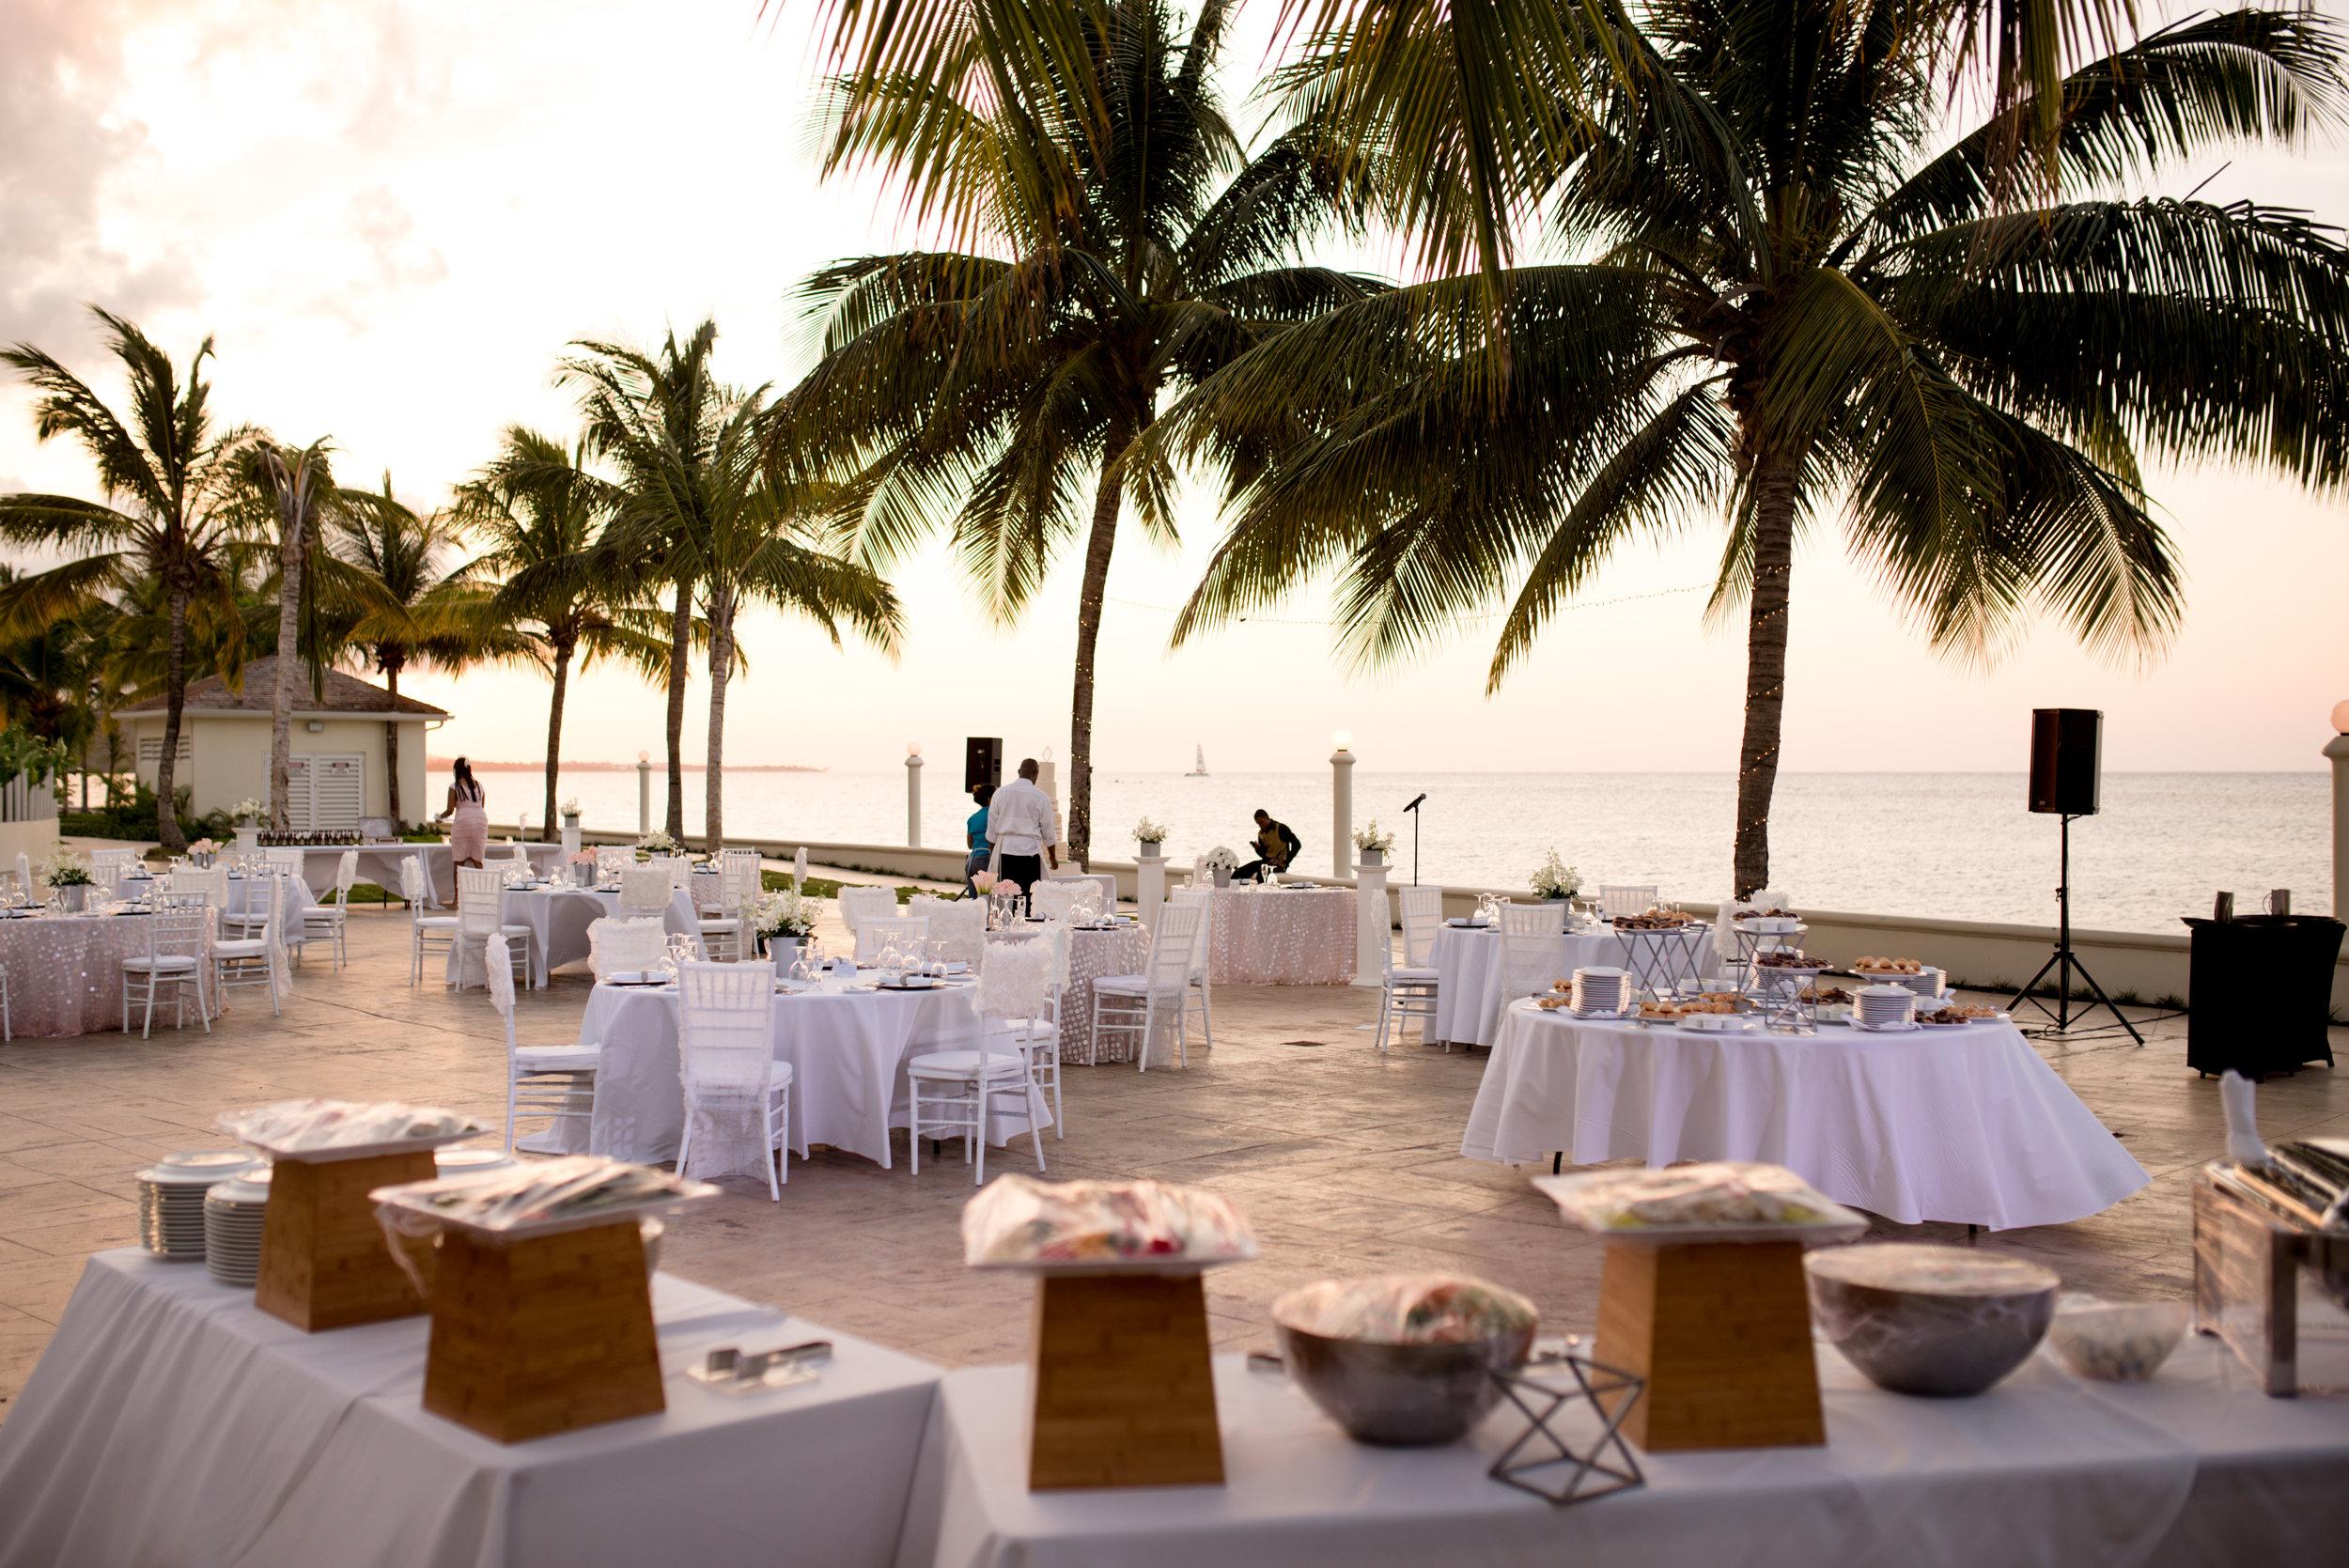 StarlighTerrace-Banquet.set up_PureTables (Blush&White tables).jpg